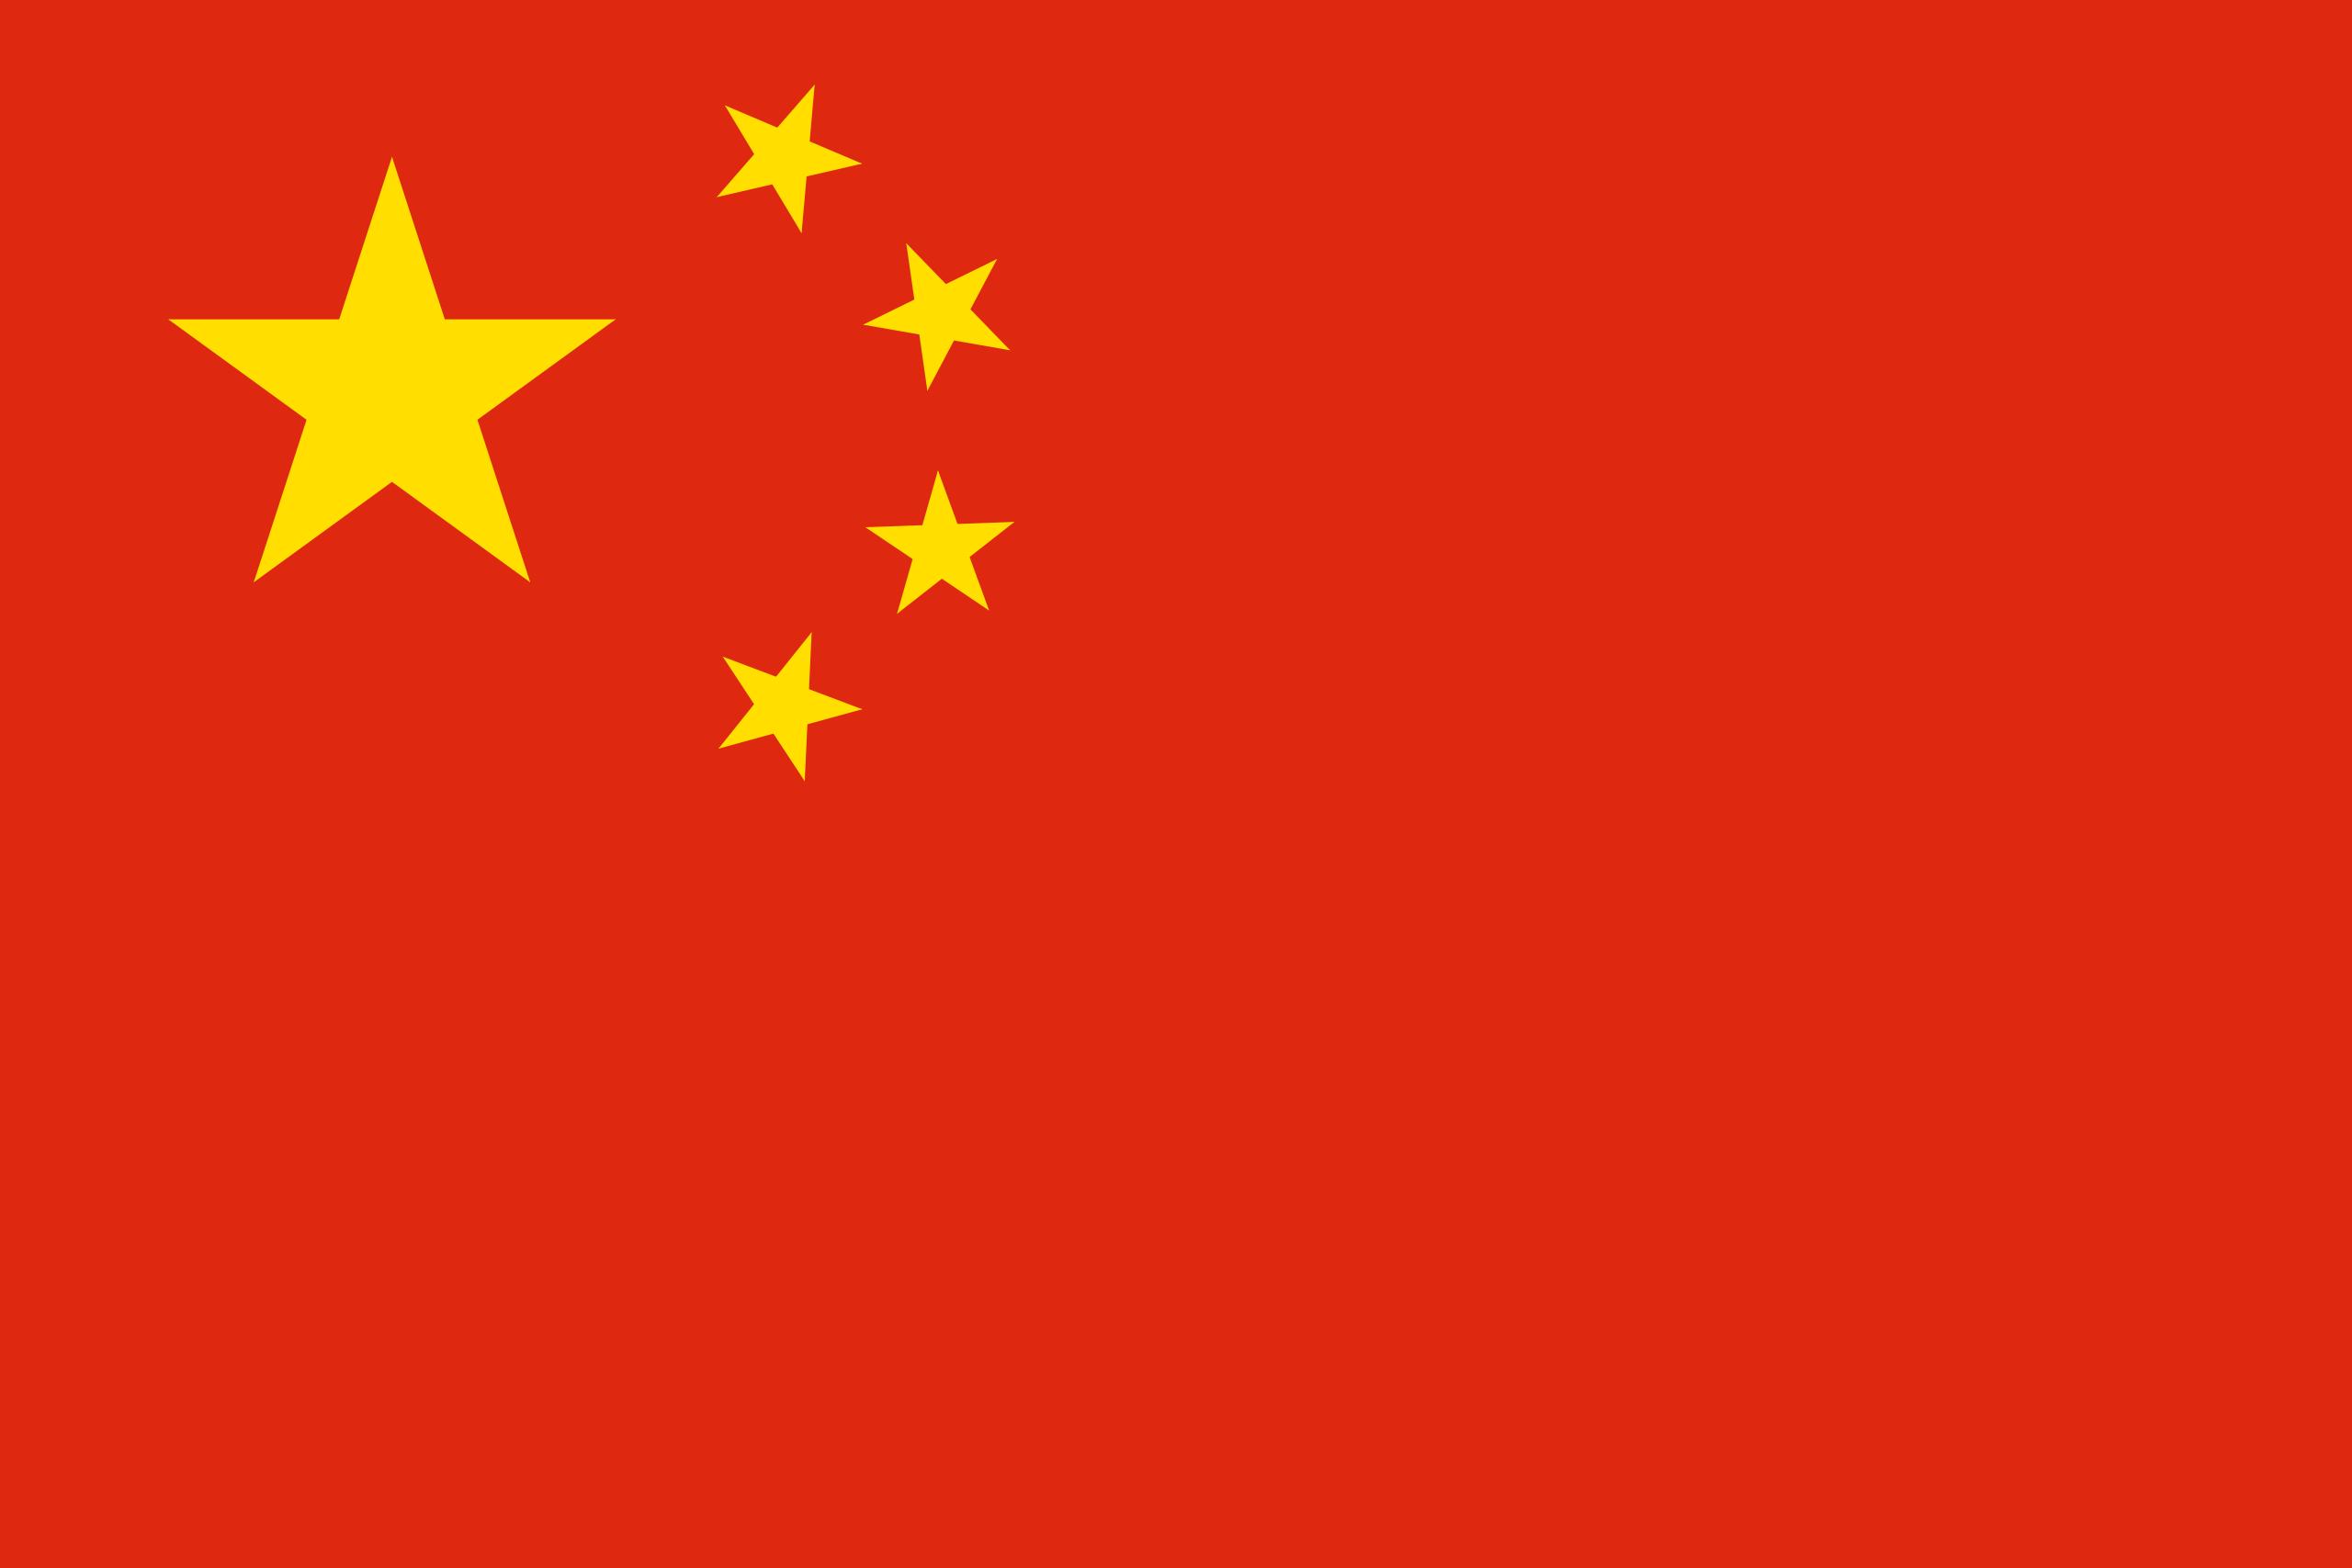 चीन, देश, emblema, लोग�प्रतीकbolo - HD वॉलपेपर - प्रोफेसर-falken.com